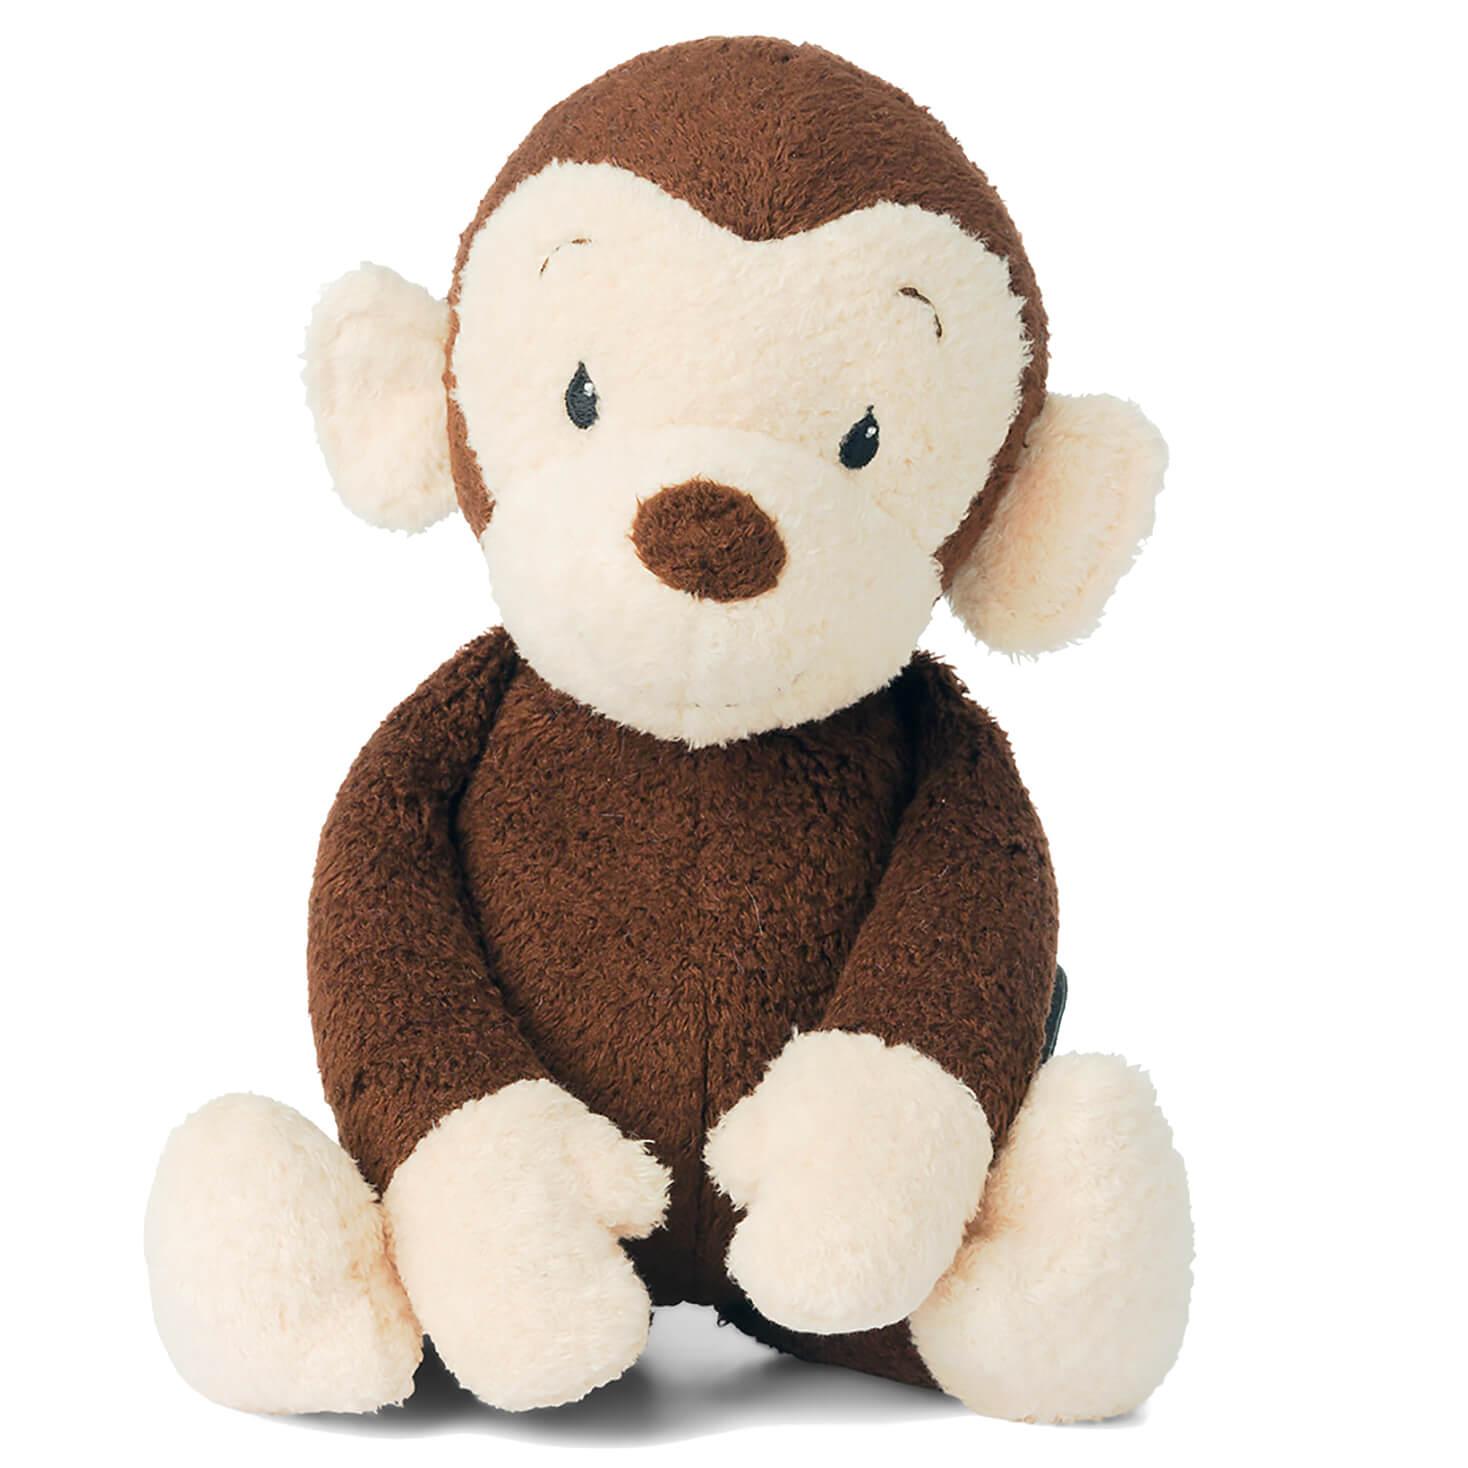 WWF Cub Club Mago the Monkey with Squeaker